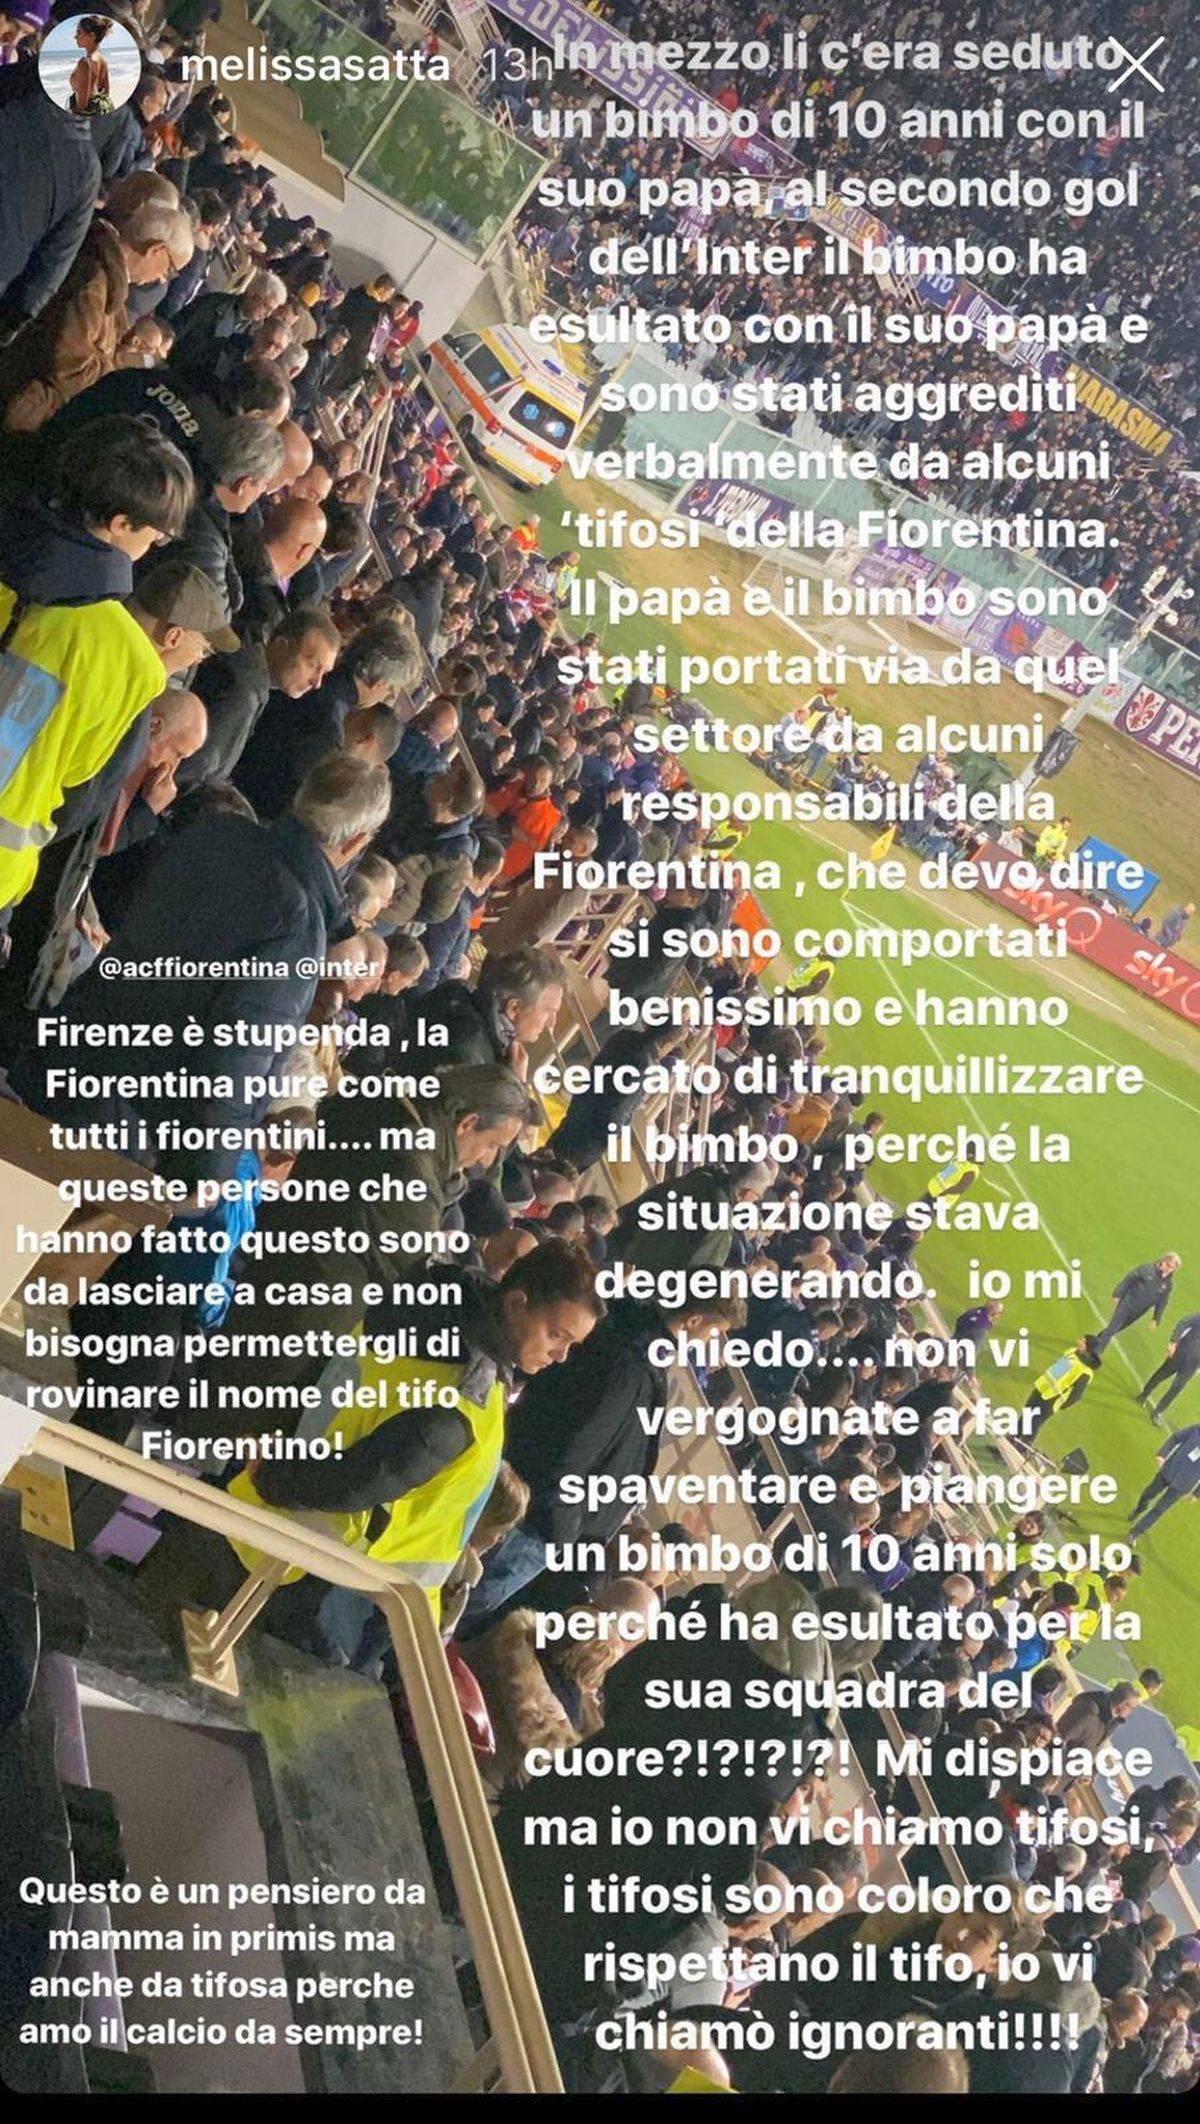 "Melissa Satta denuncia social: ""A Firenze bimbo interista aggredito, vergogna"""